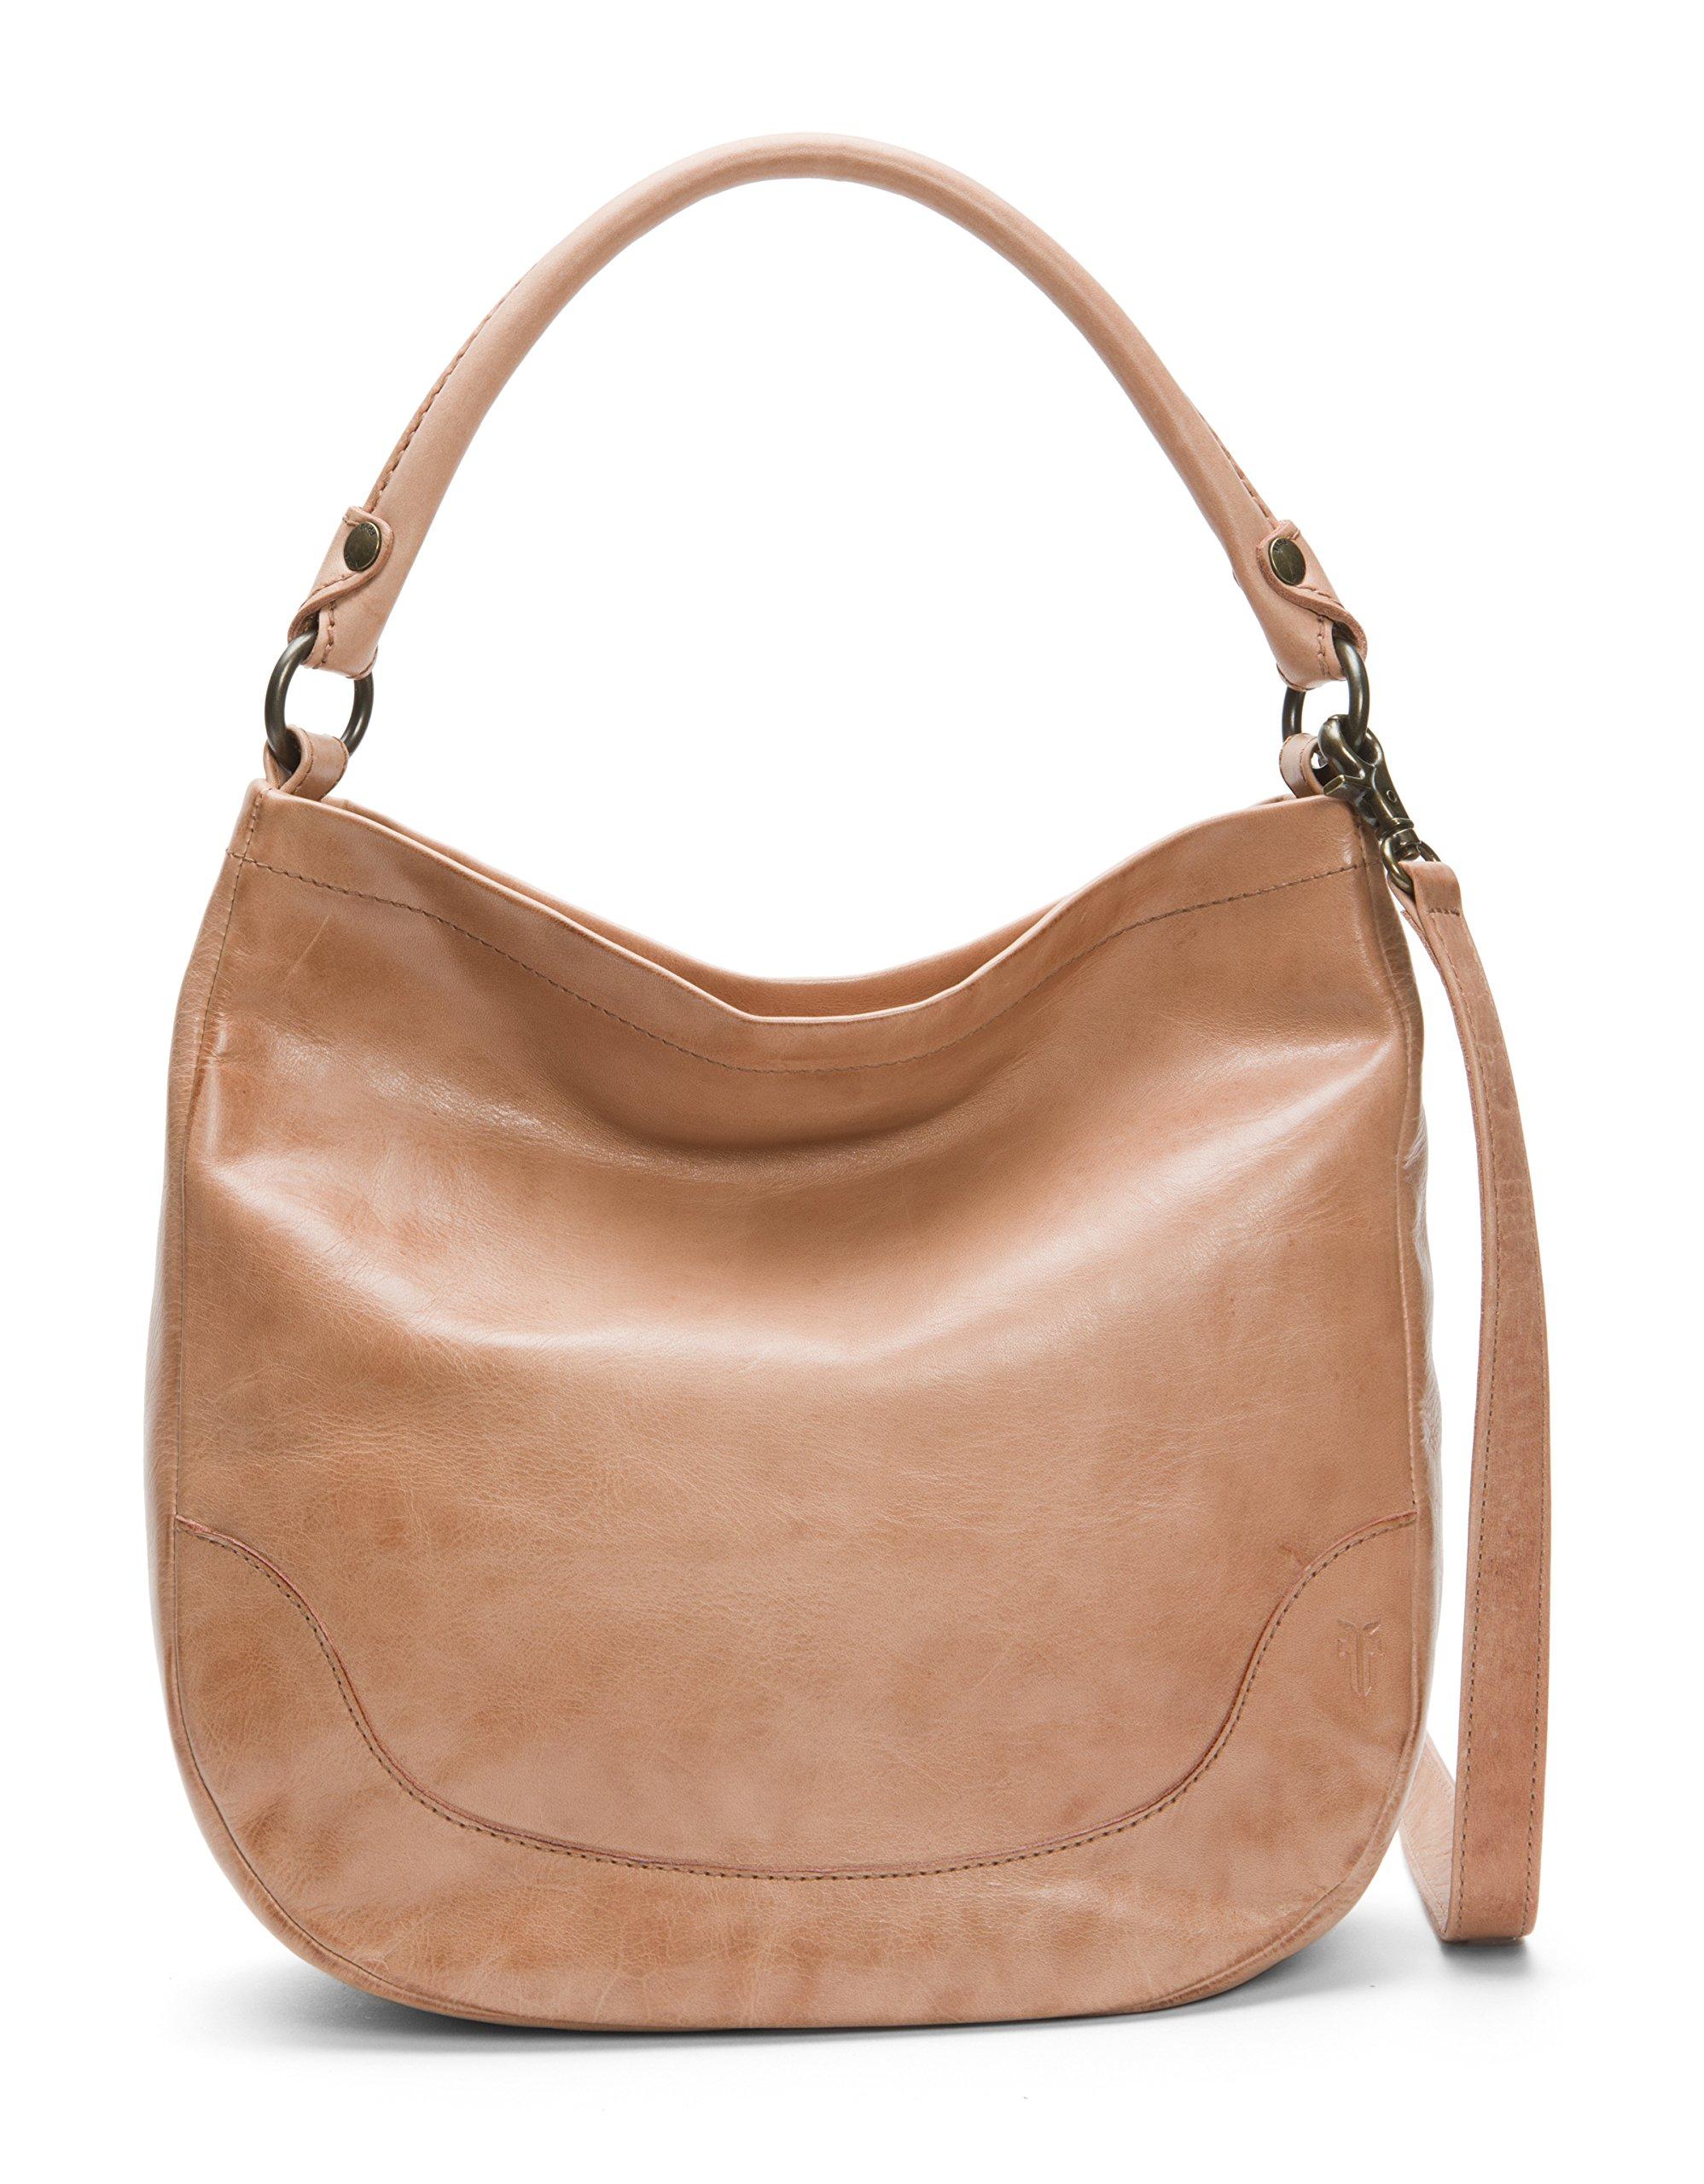 FRYE Melissa Hobo Leather Handbag, dusty rose